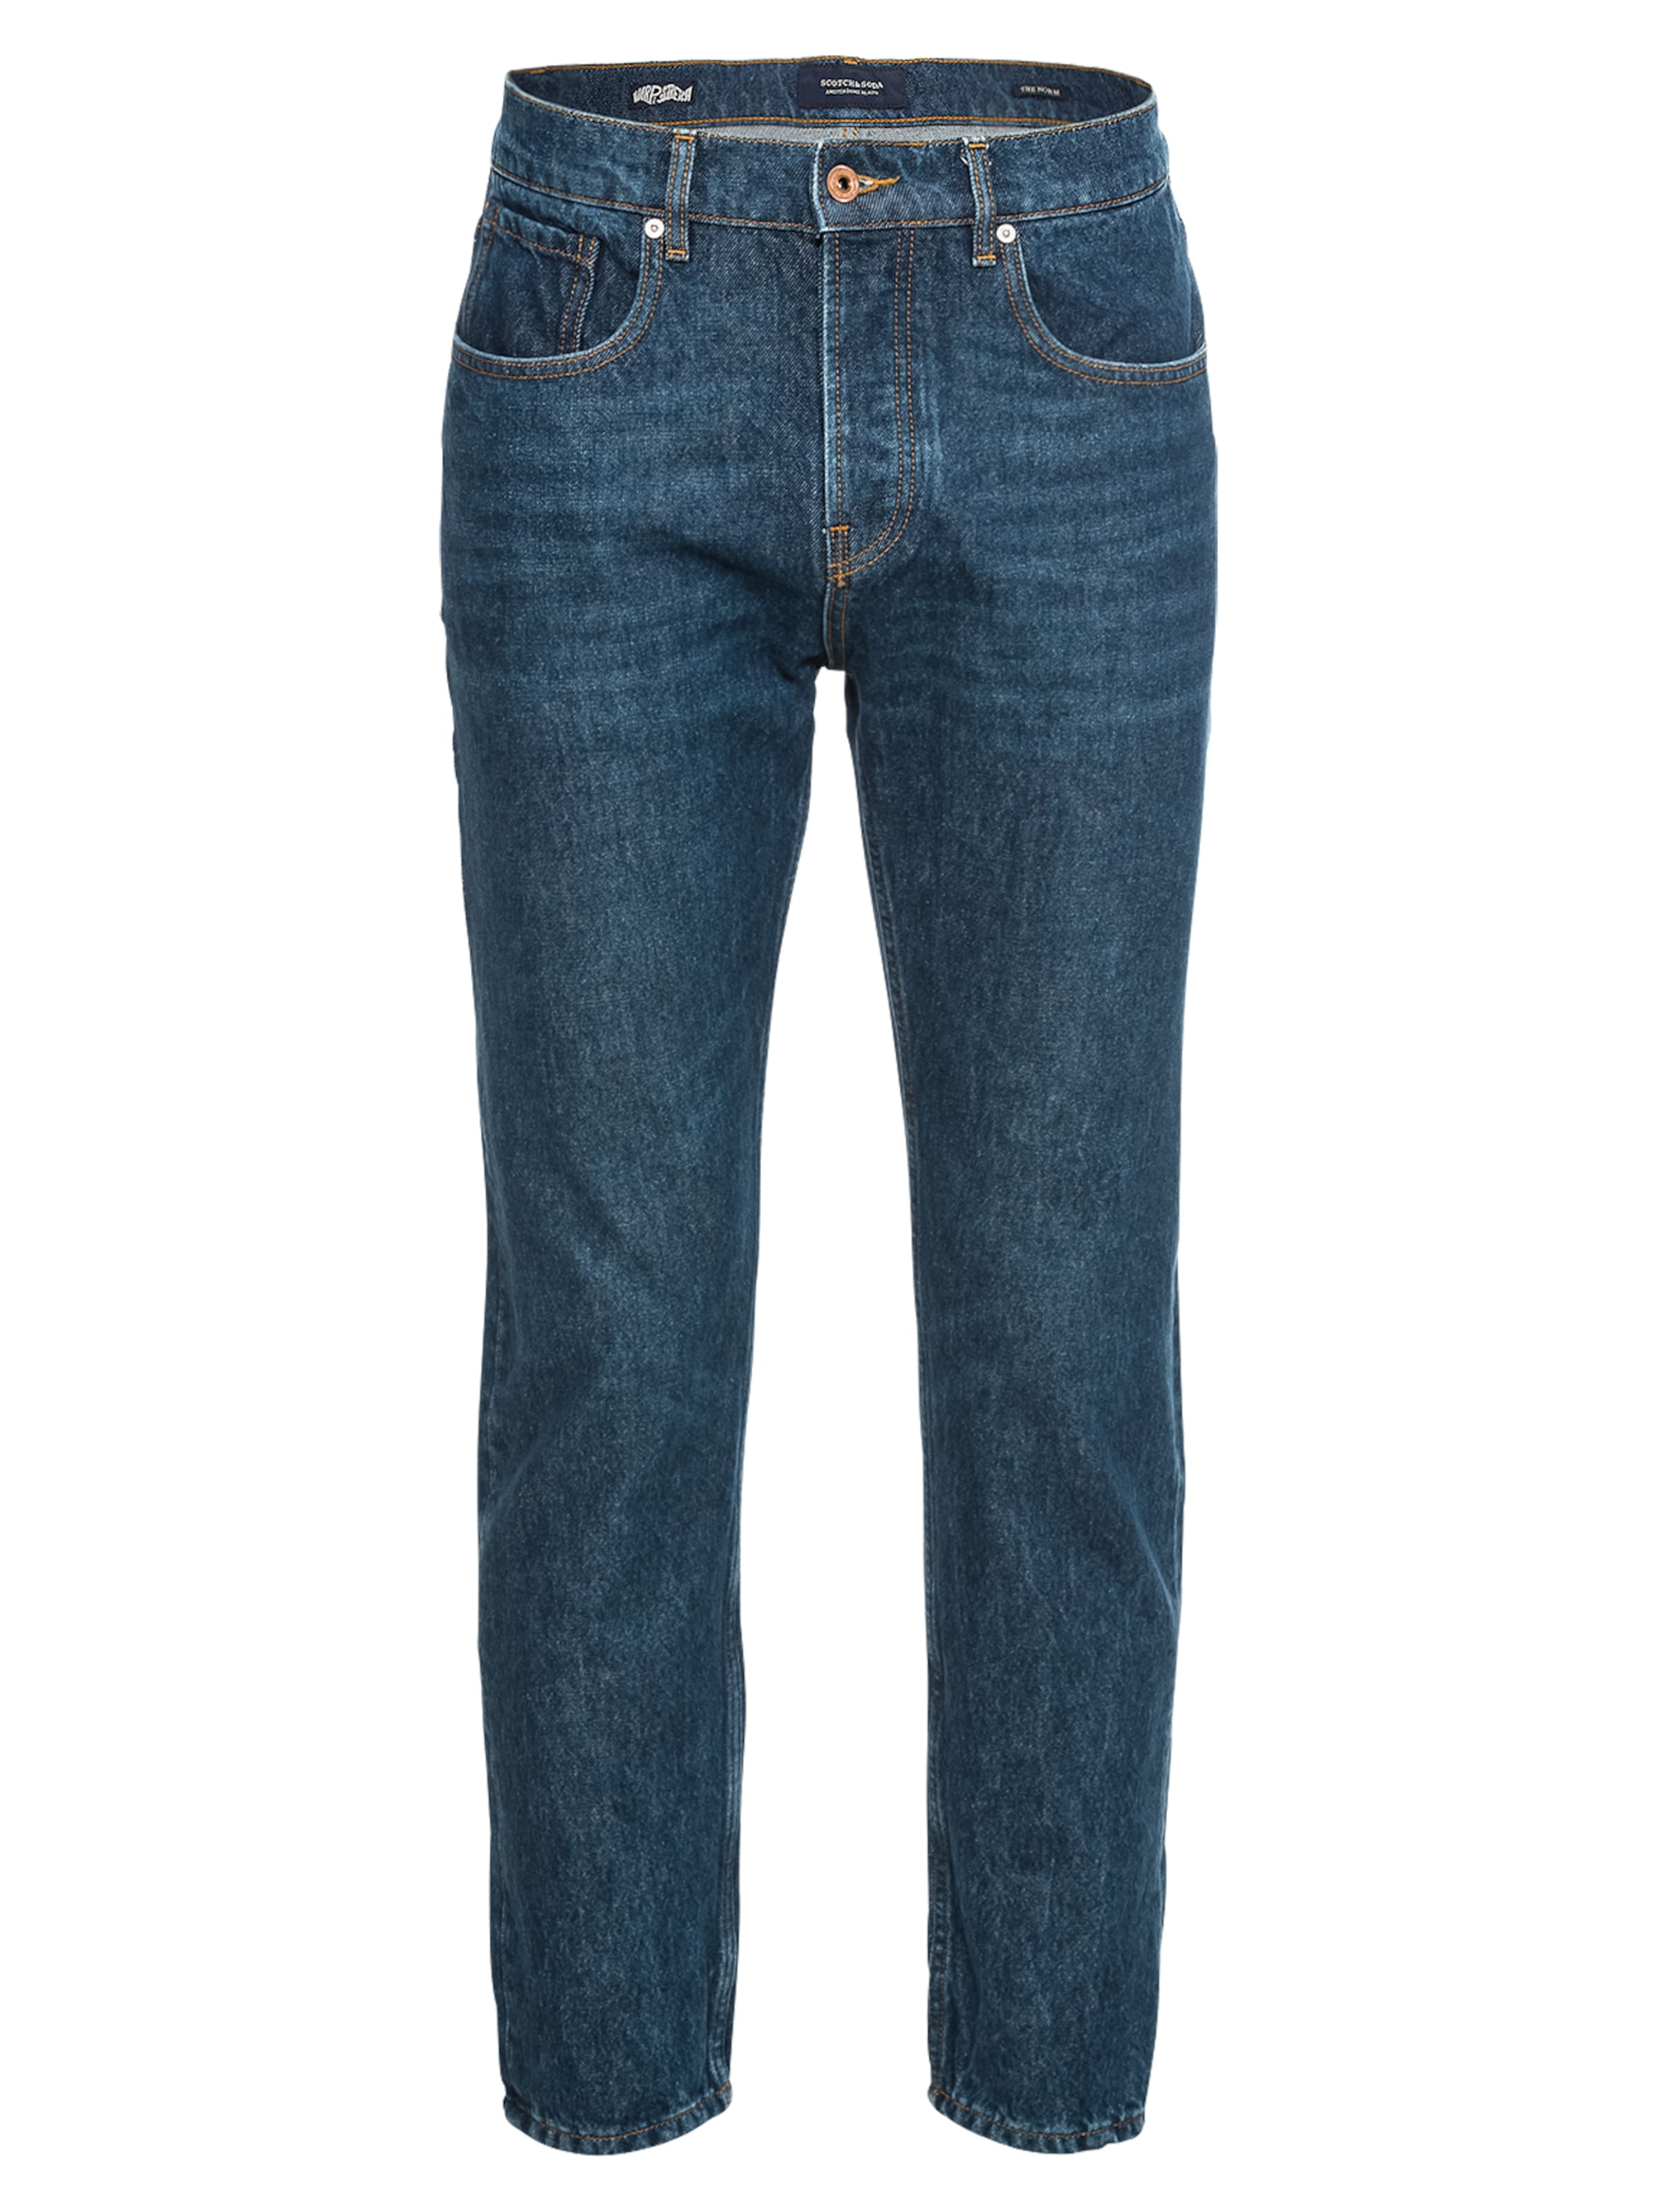 Shade' Blue NormSimple Denim Scotchamp; Soda In Jeans 'the H2WDYE9I